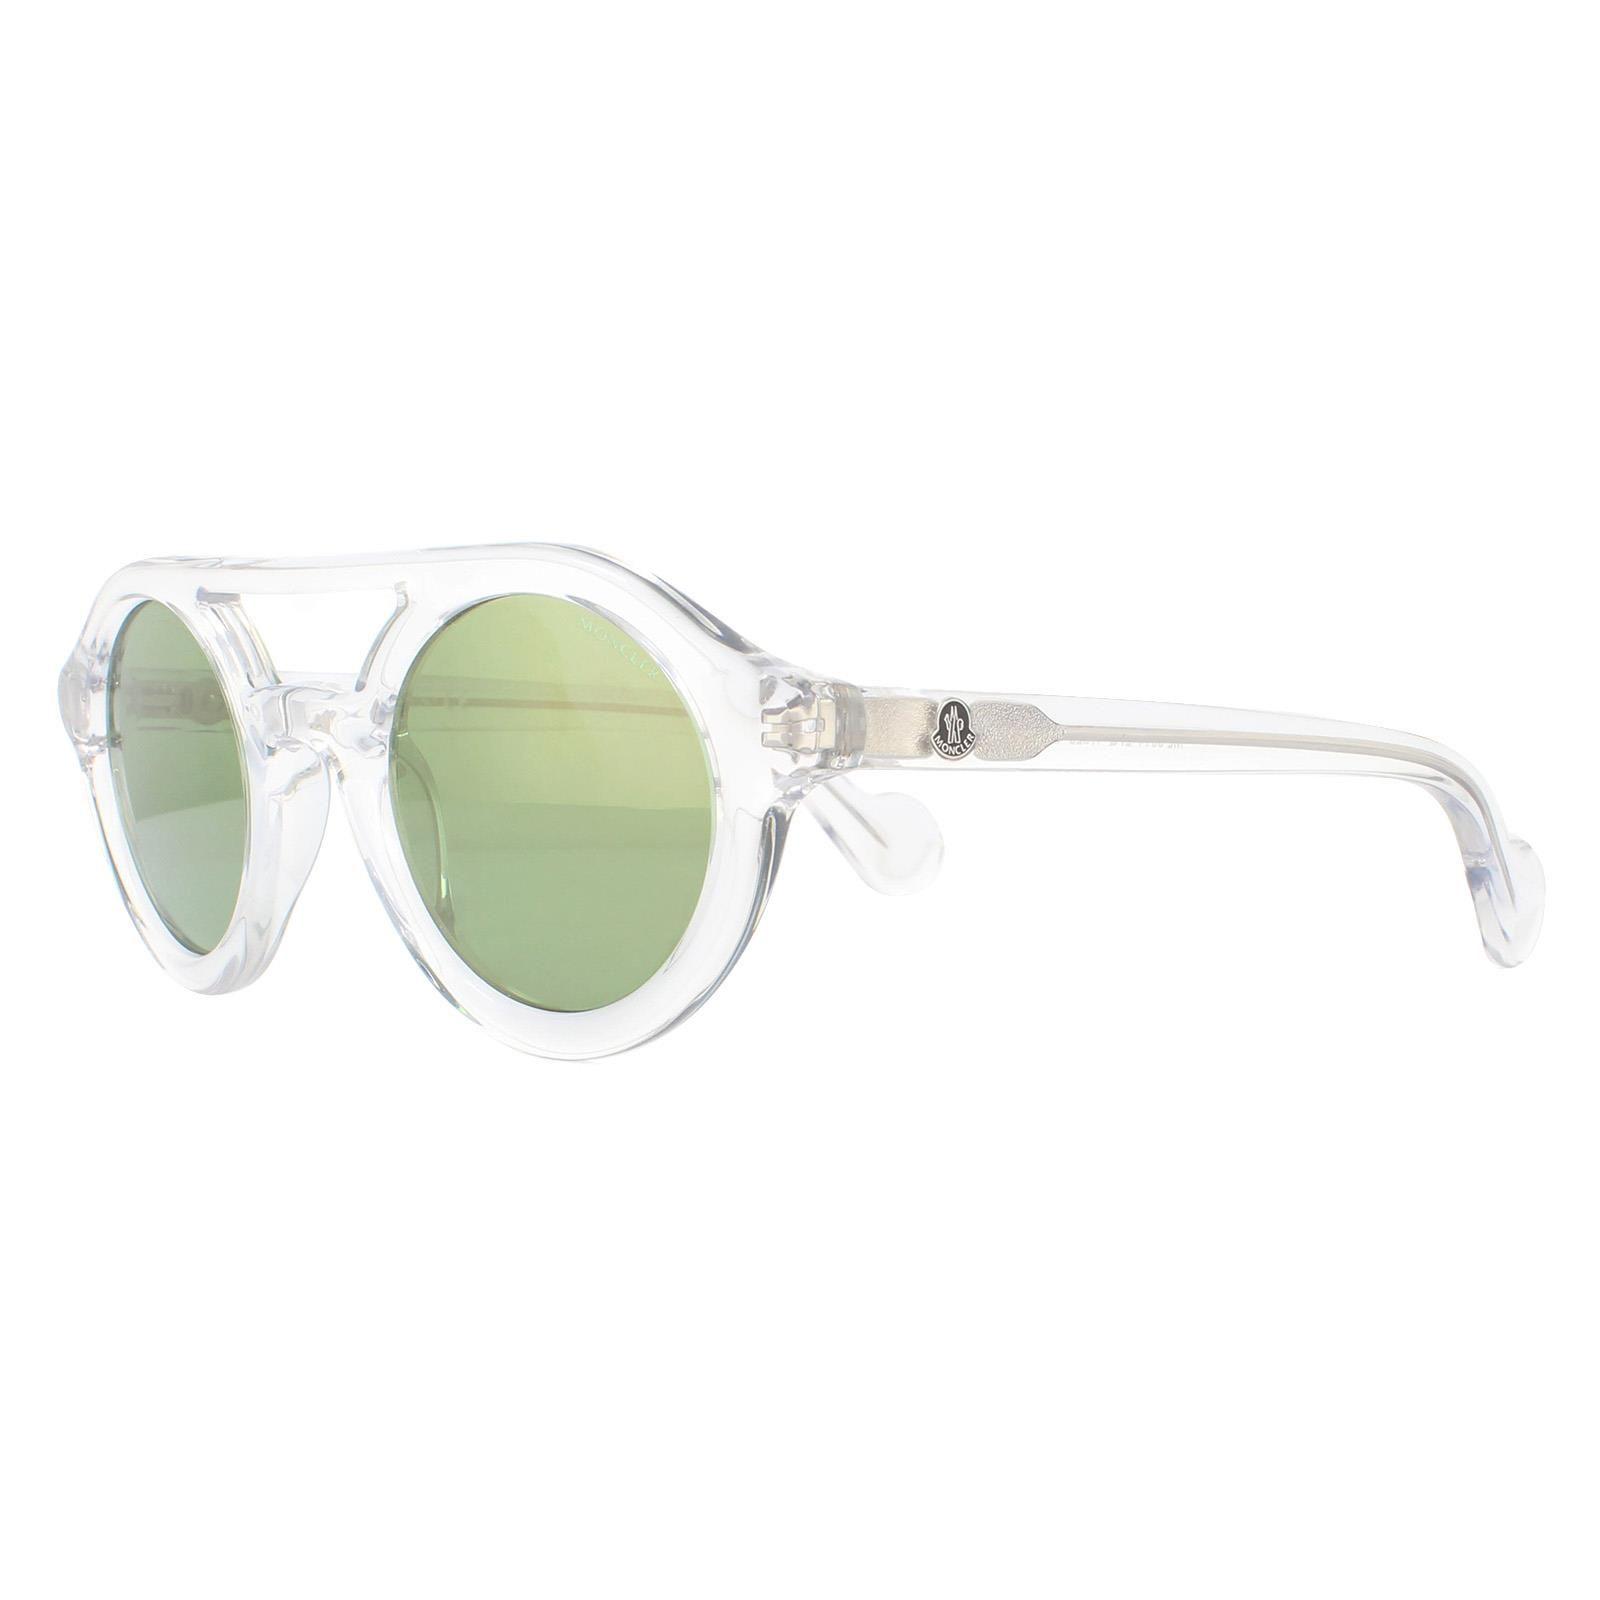 Moncler Sunglasses ML0014 27Q Crystal Green Mirror